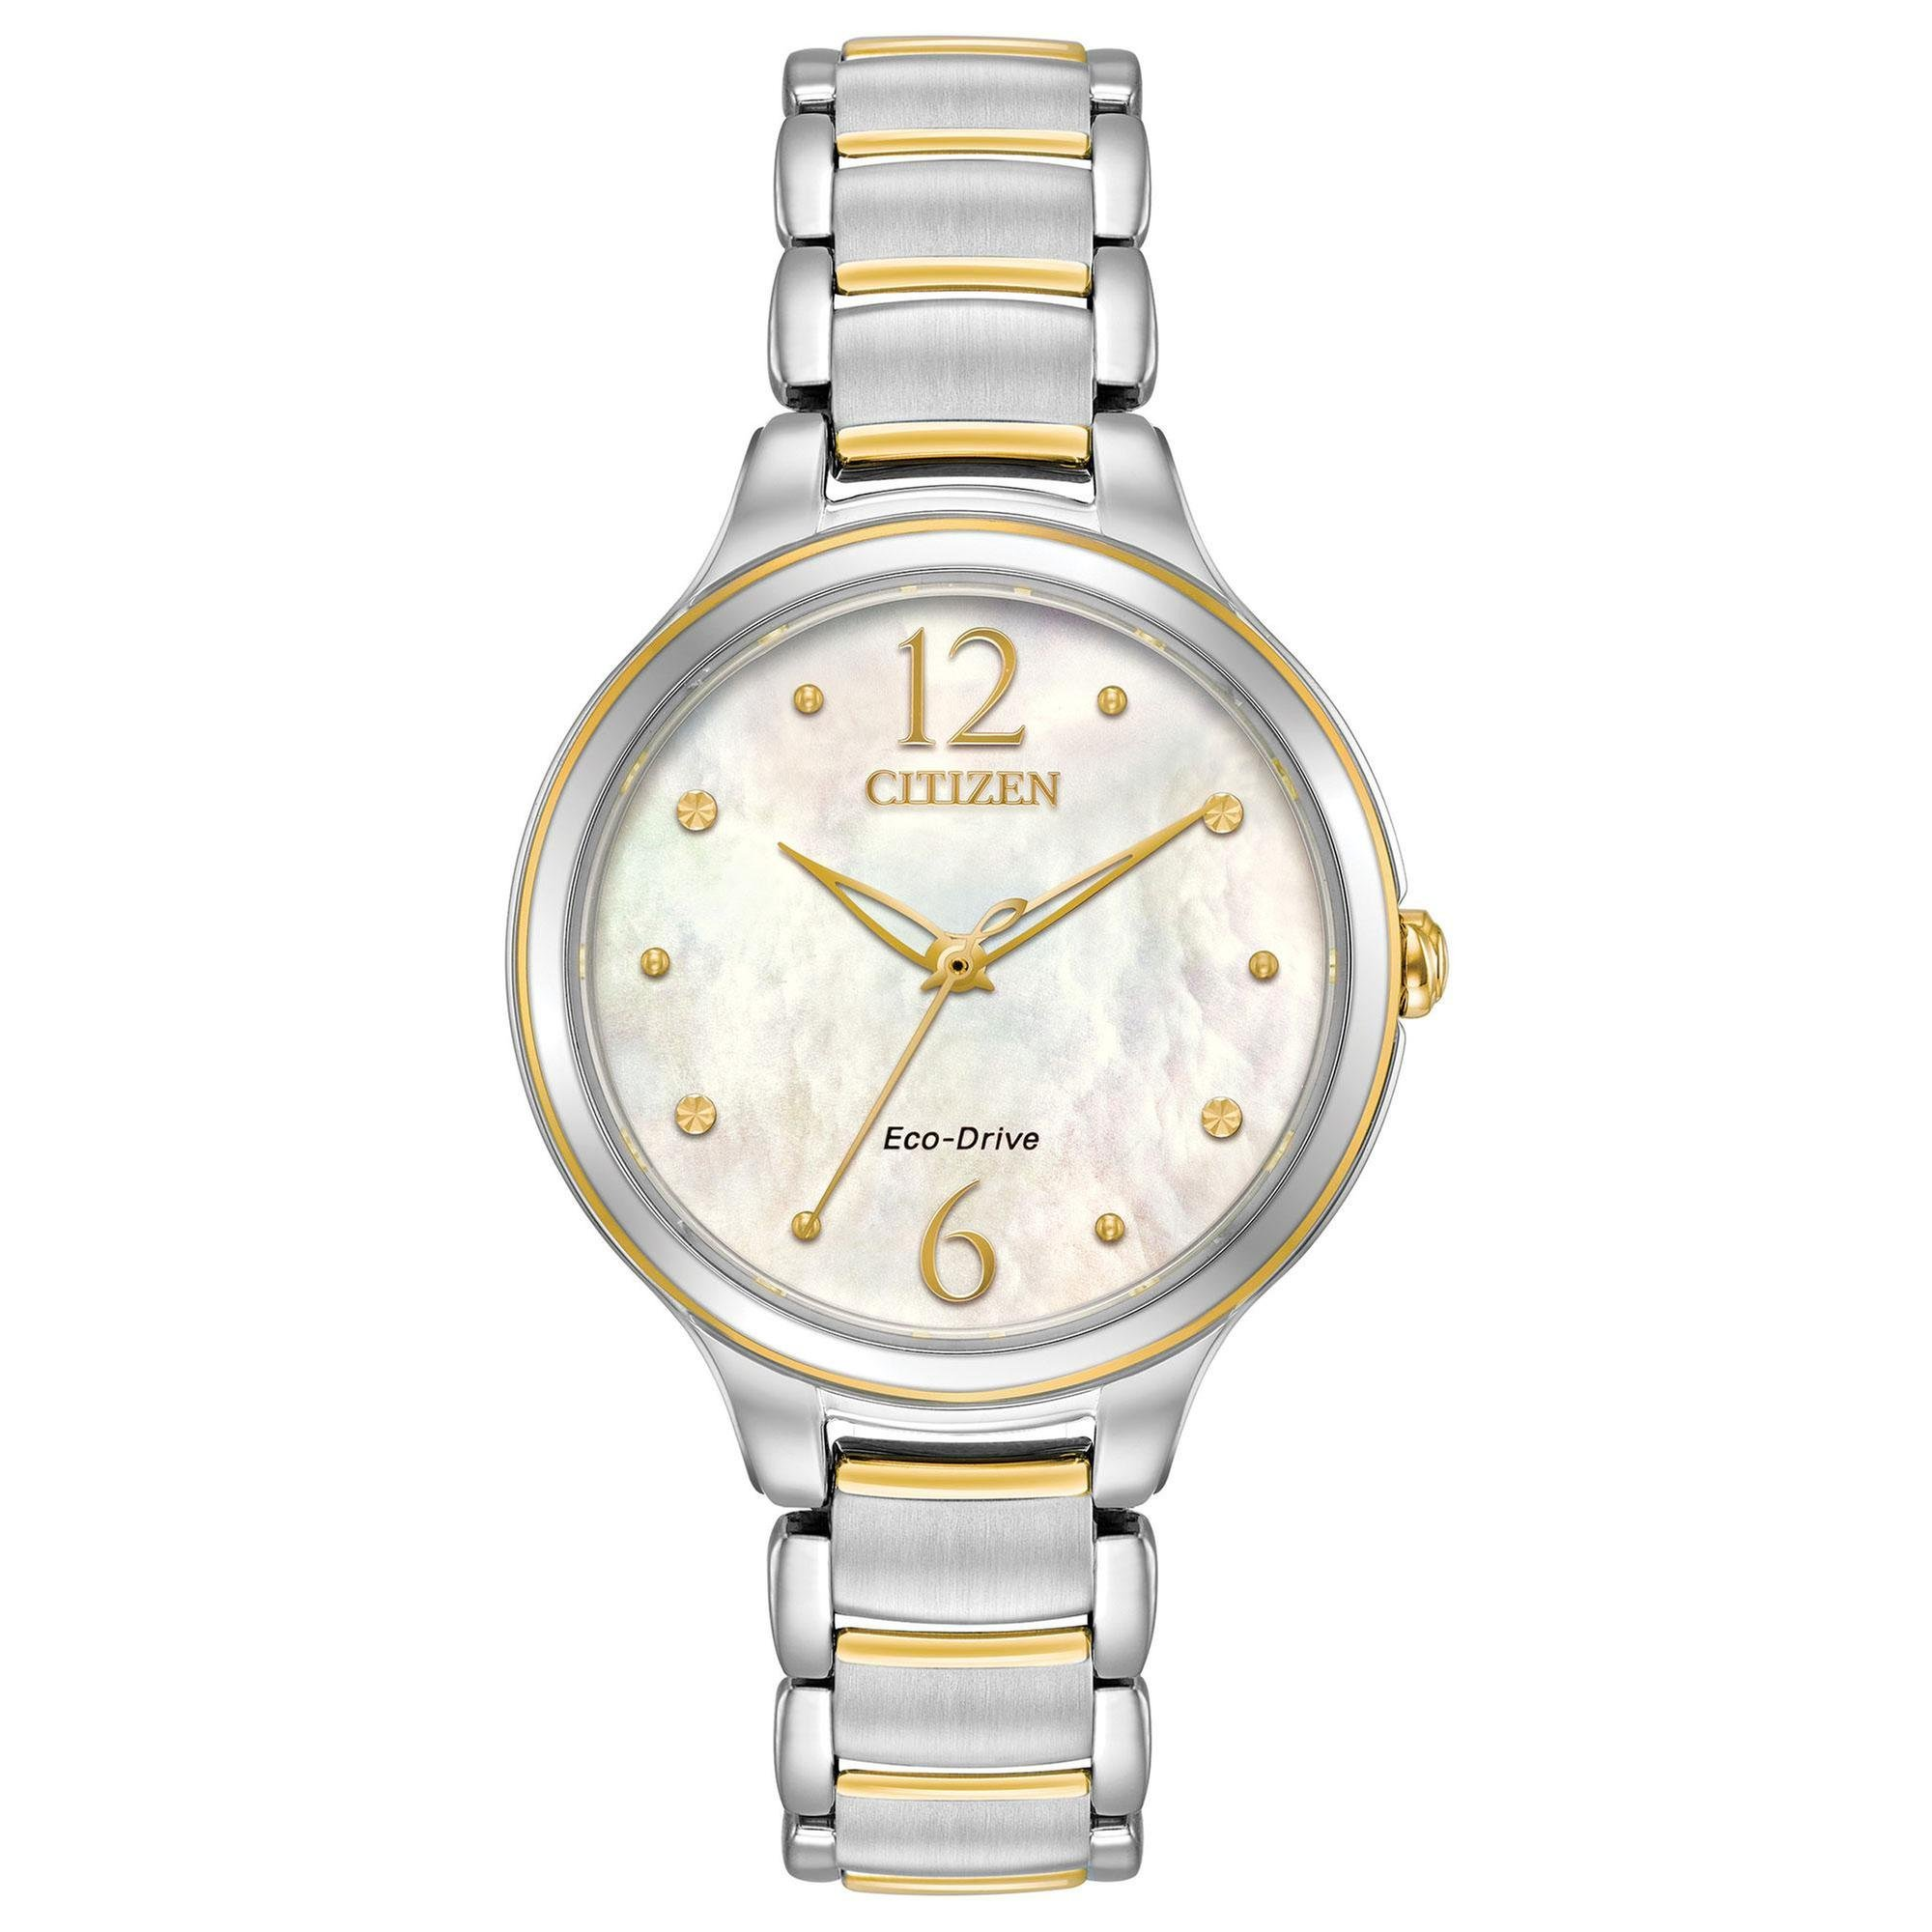 Citizen Women's 'Eco-Drive' Quartz Stainless Steel Casual Watch, Color:Two Tone (Model: EM0554-58N)